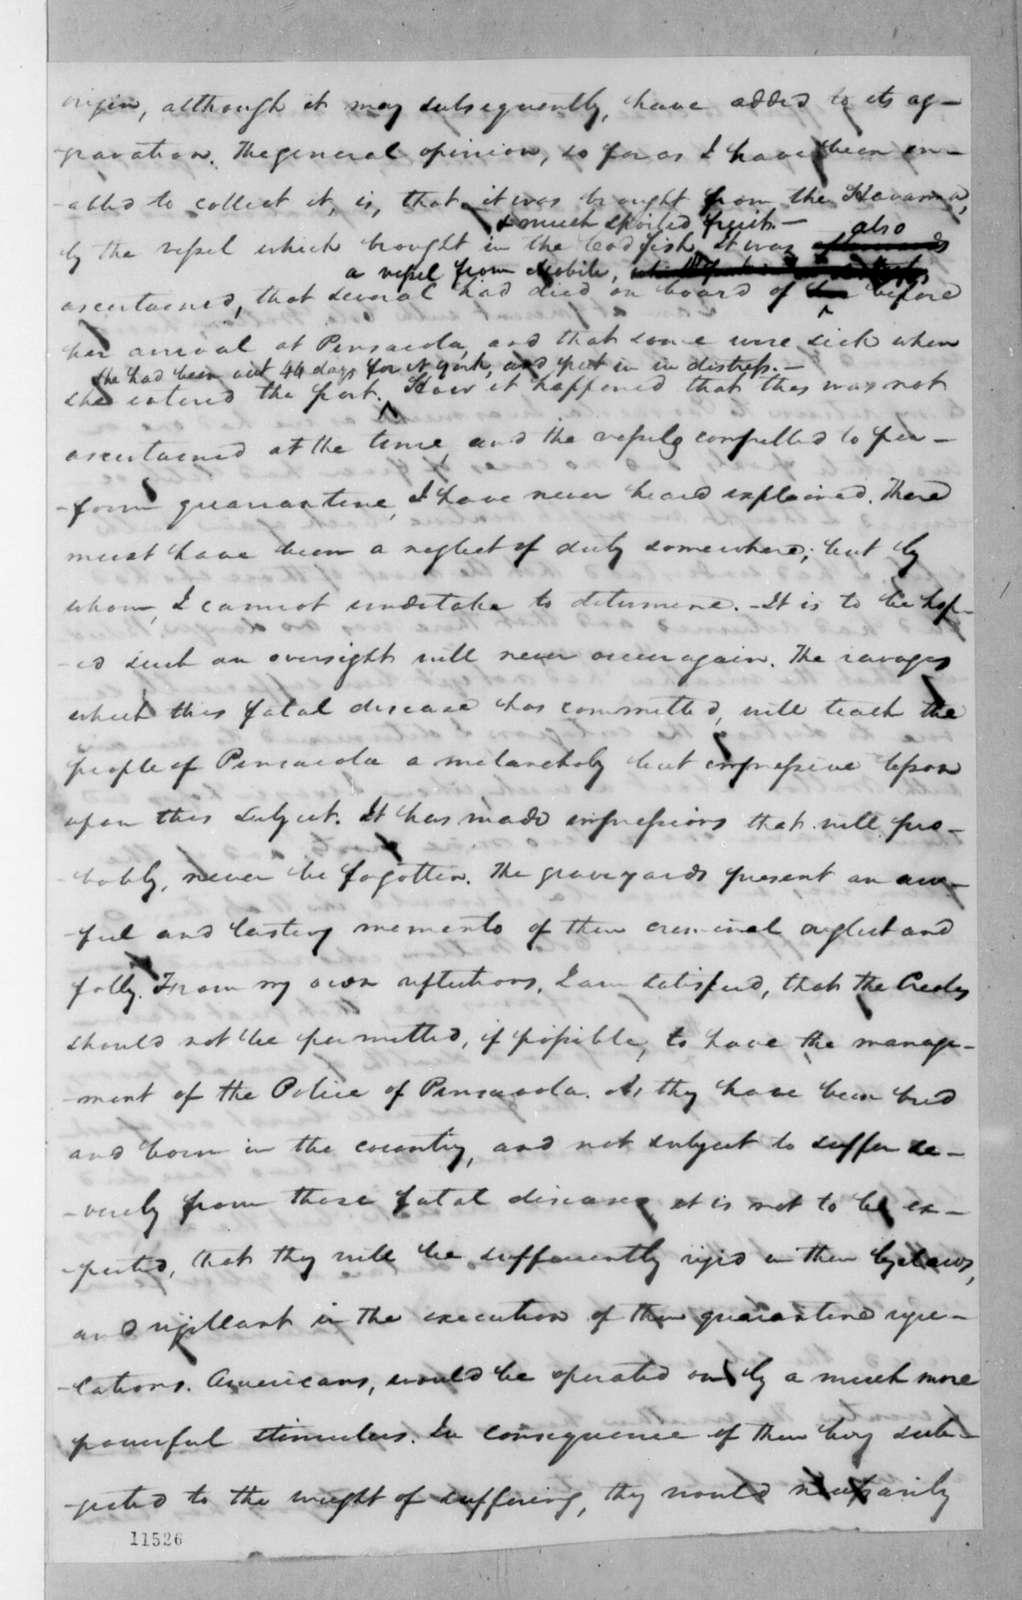 Samuel Ragland Overton to Andrew Jackson, November 30, 1822